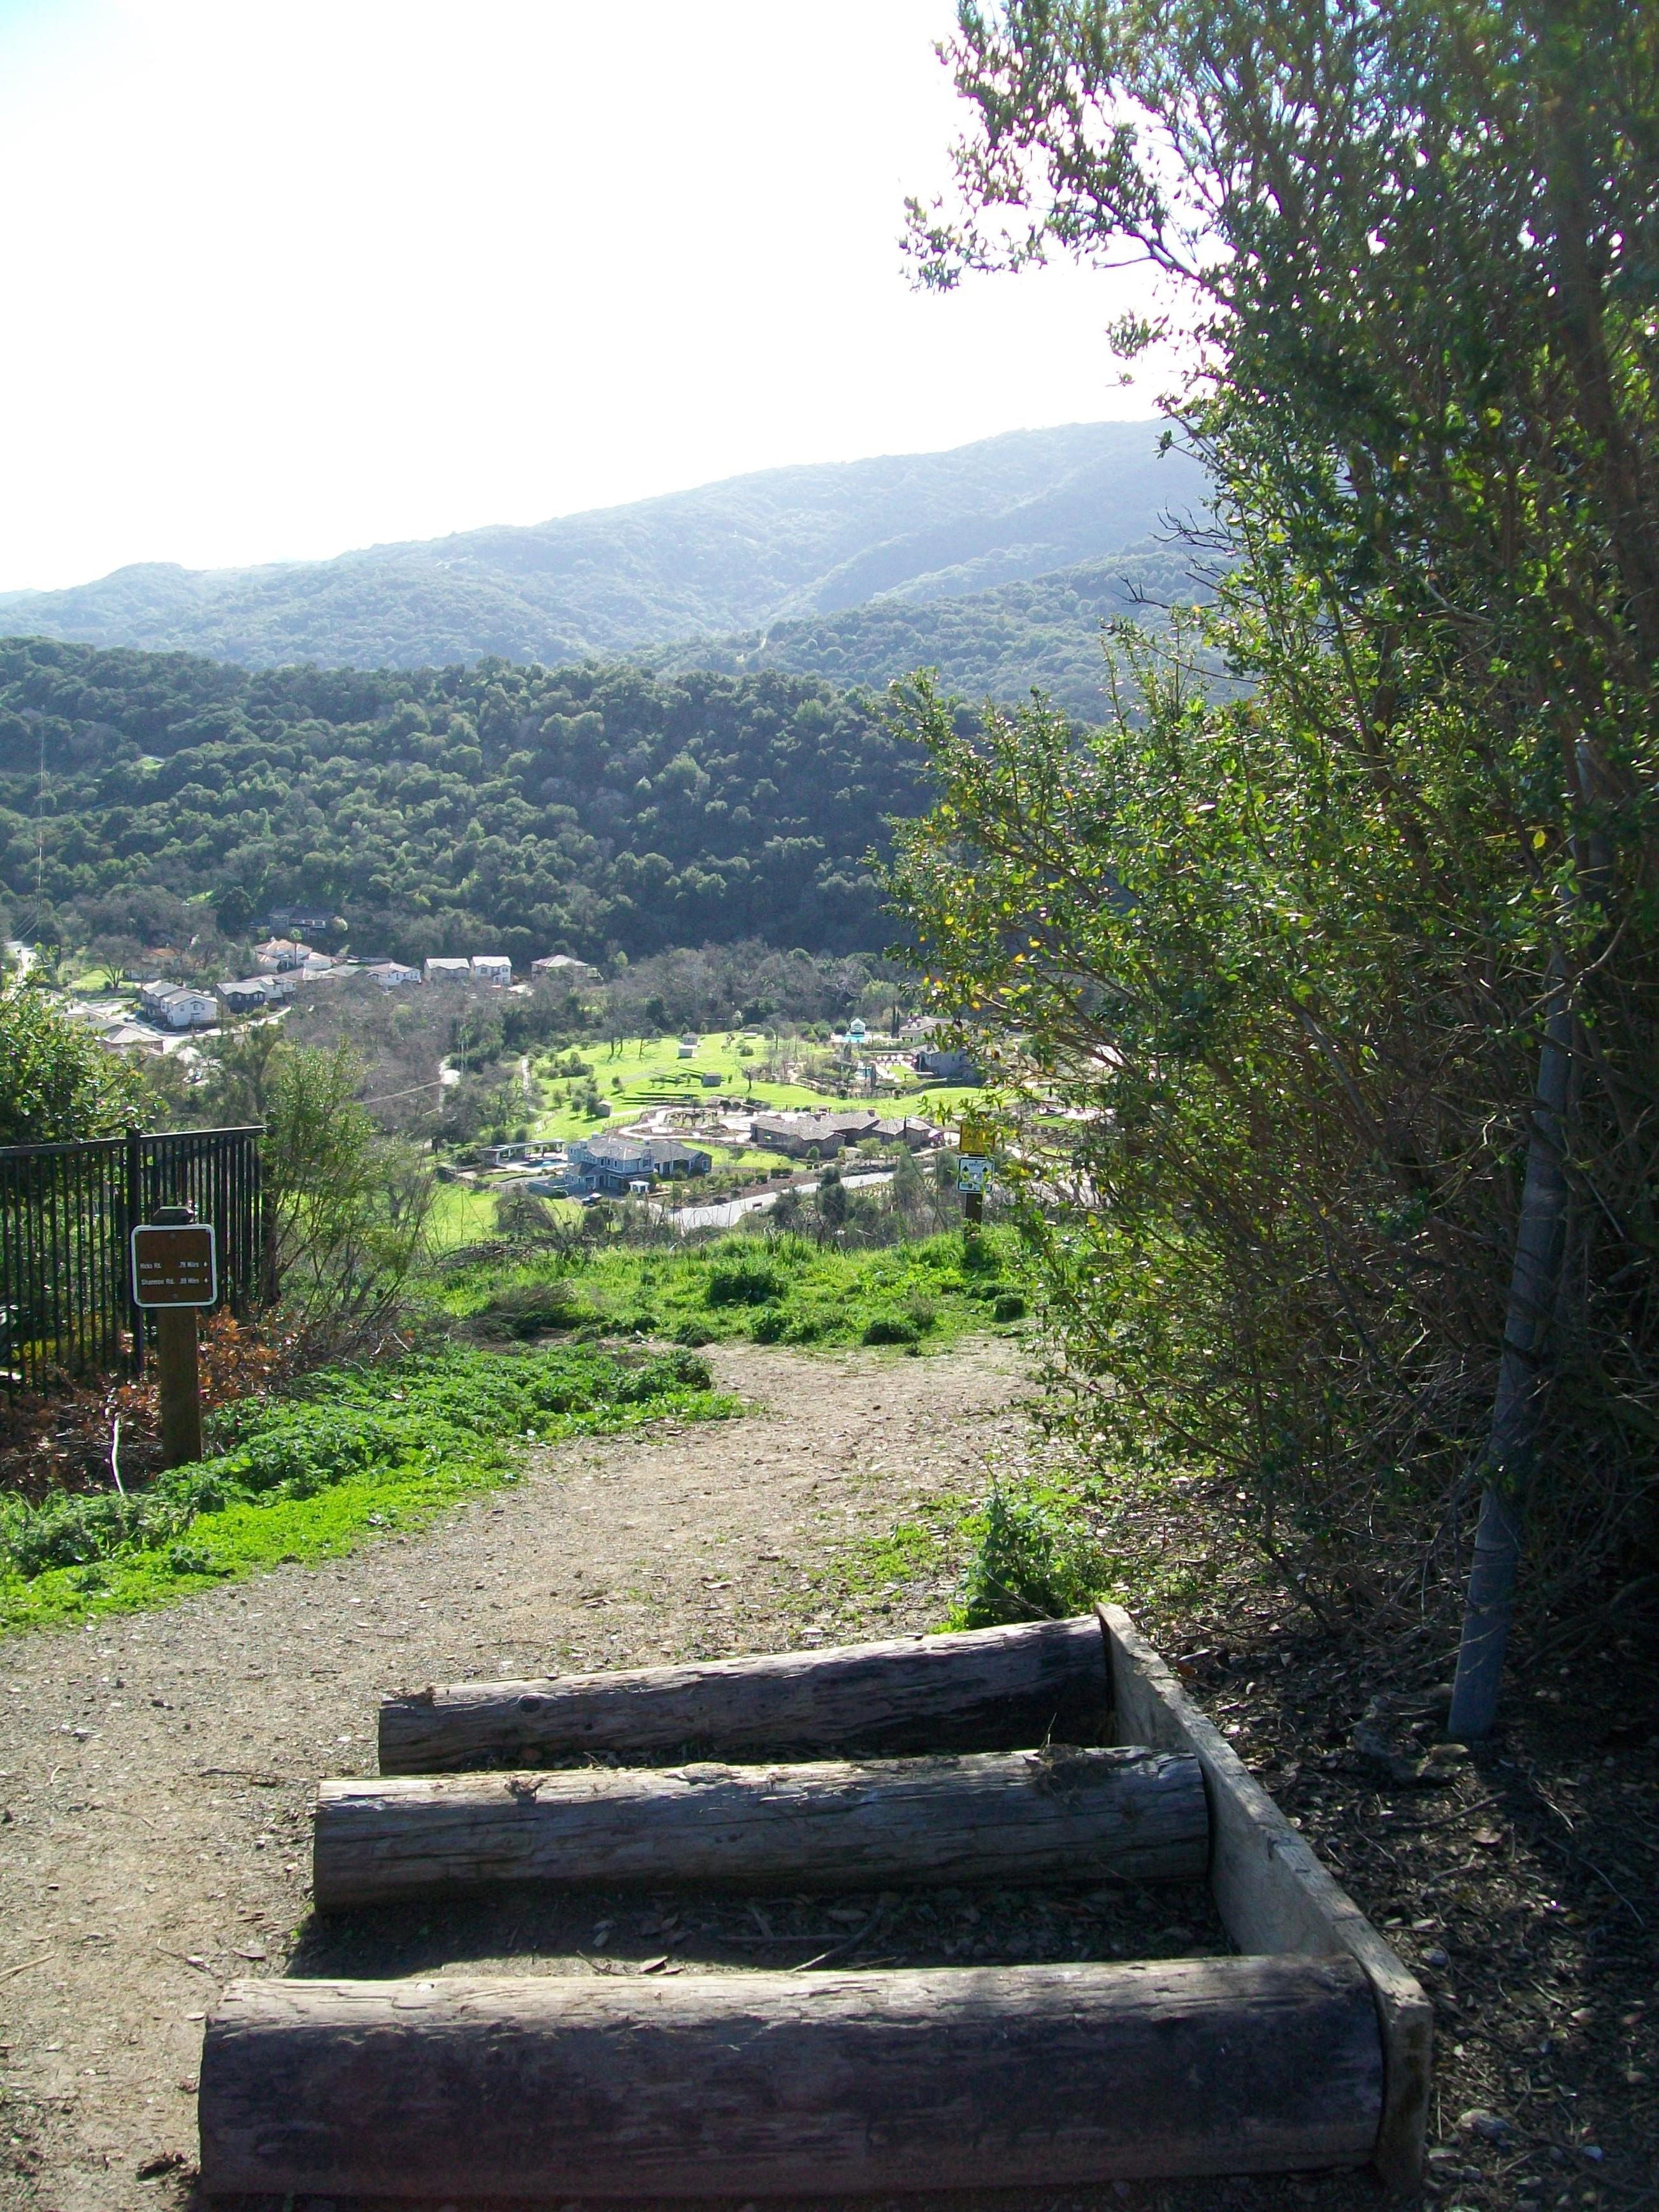 Santa Rosa view to Shannon Valley Ranch - Santa Rosa Drive and Sierra Azule neighborhood